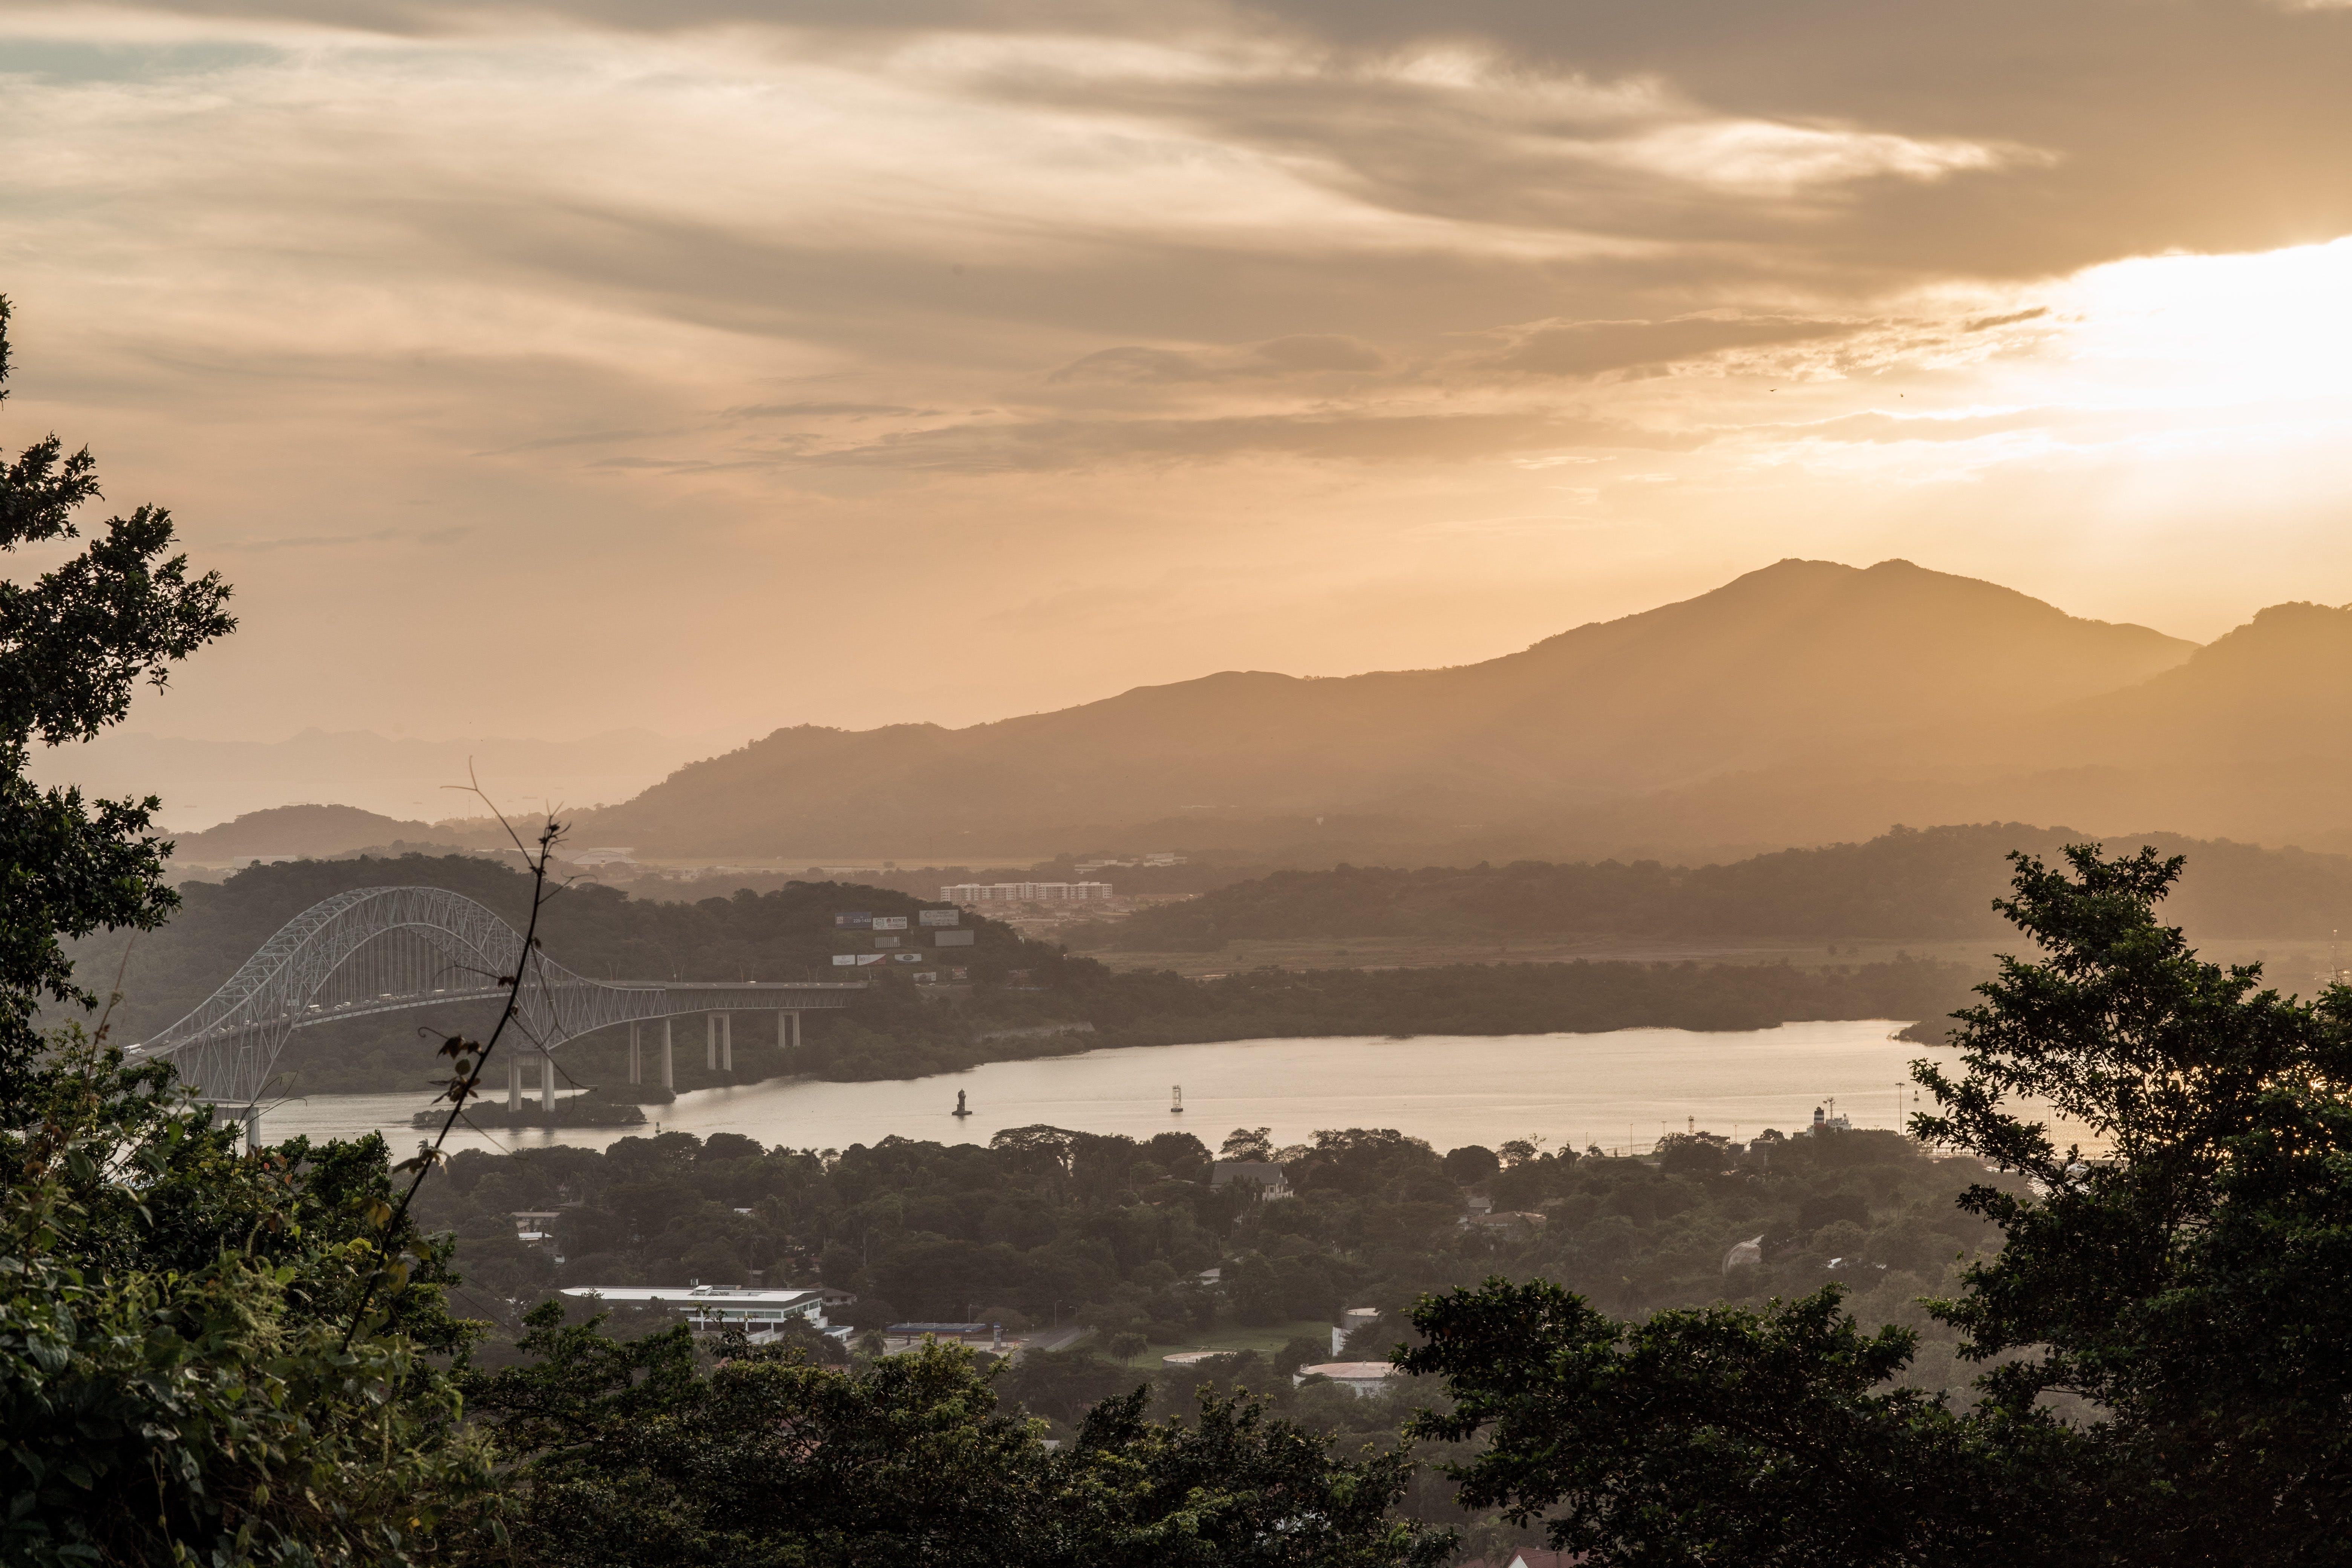 Top View Photography of Bridge